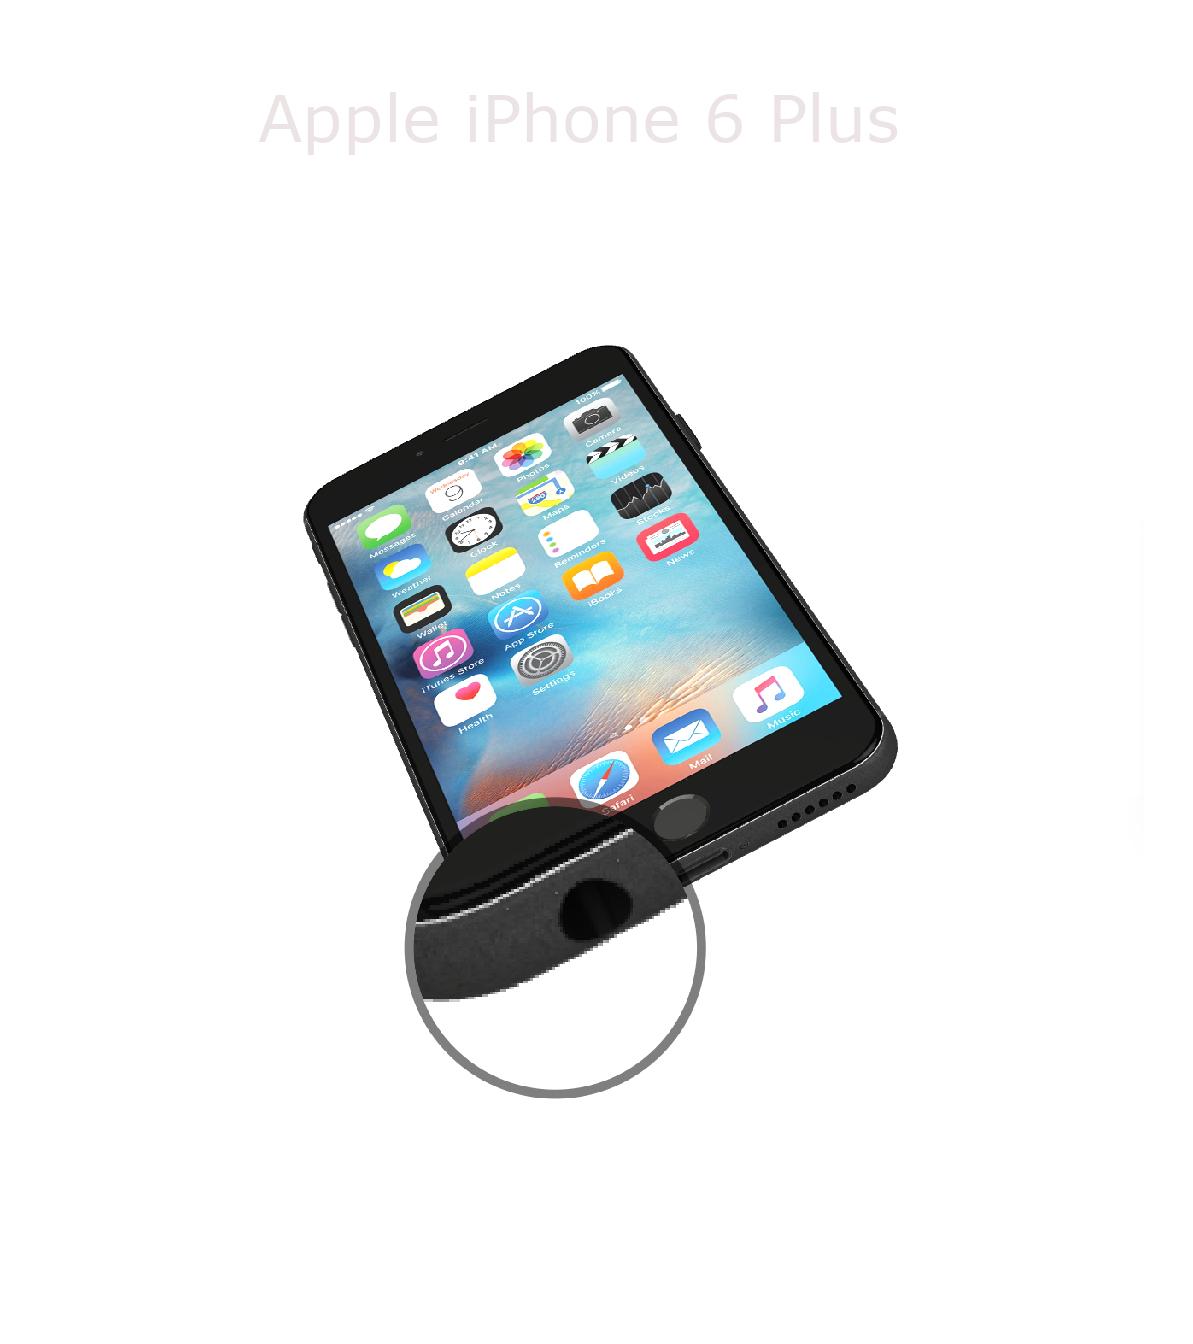 Laga audiokontakt iPhone 6 plus